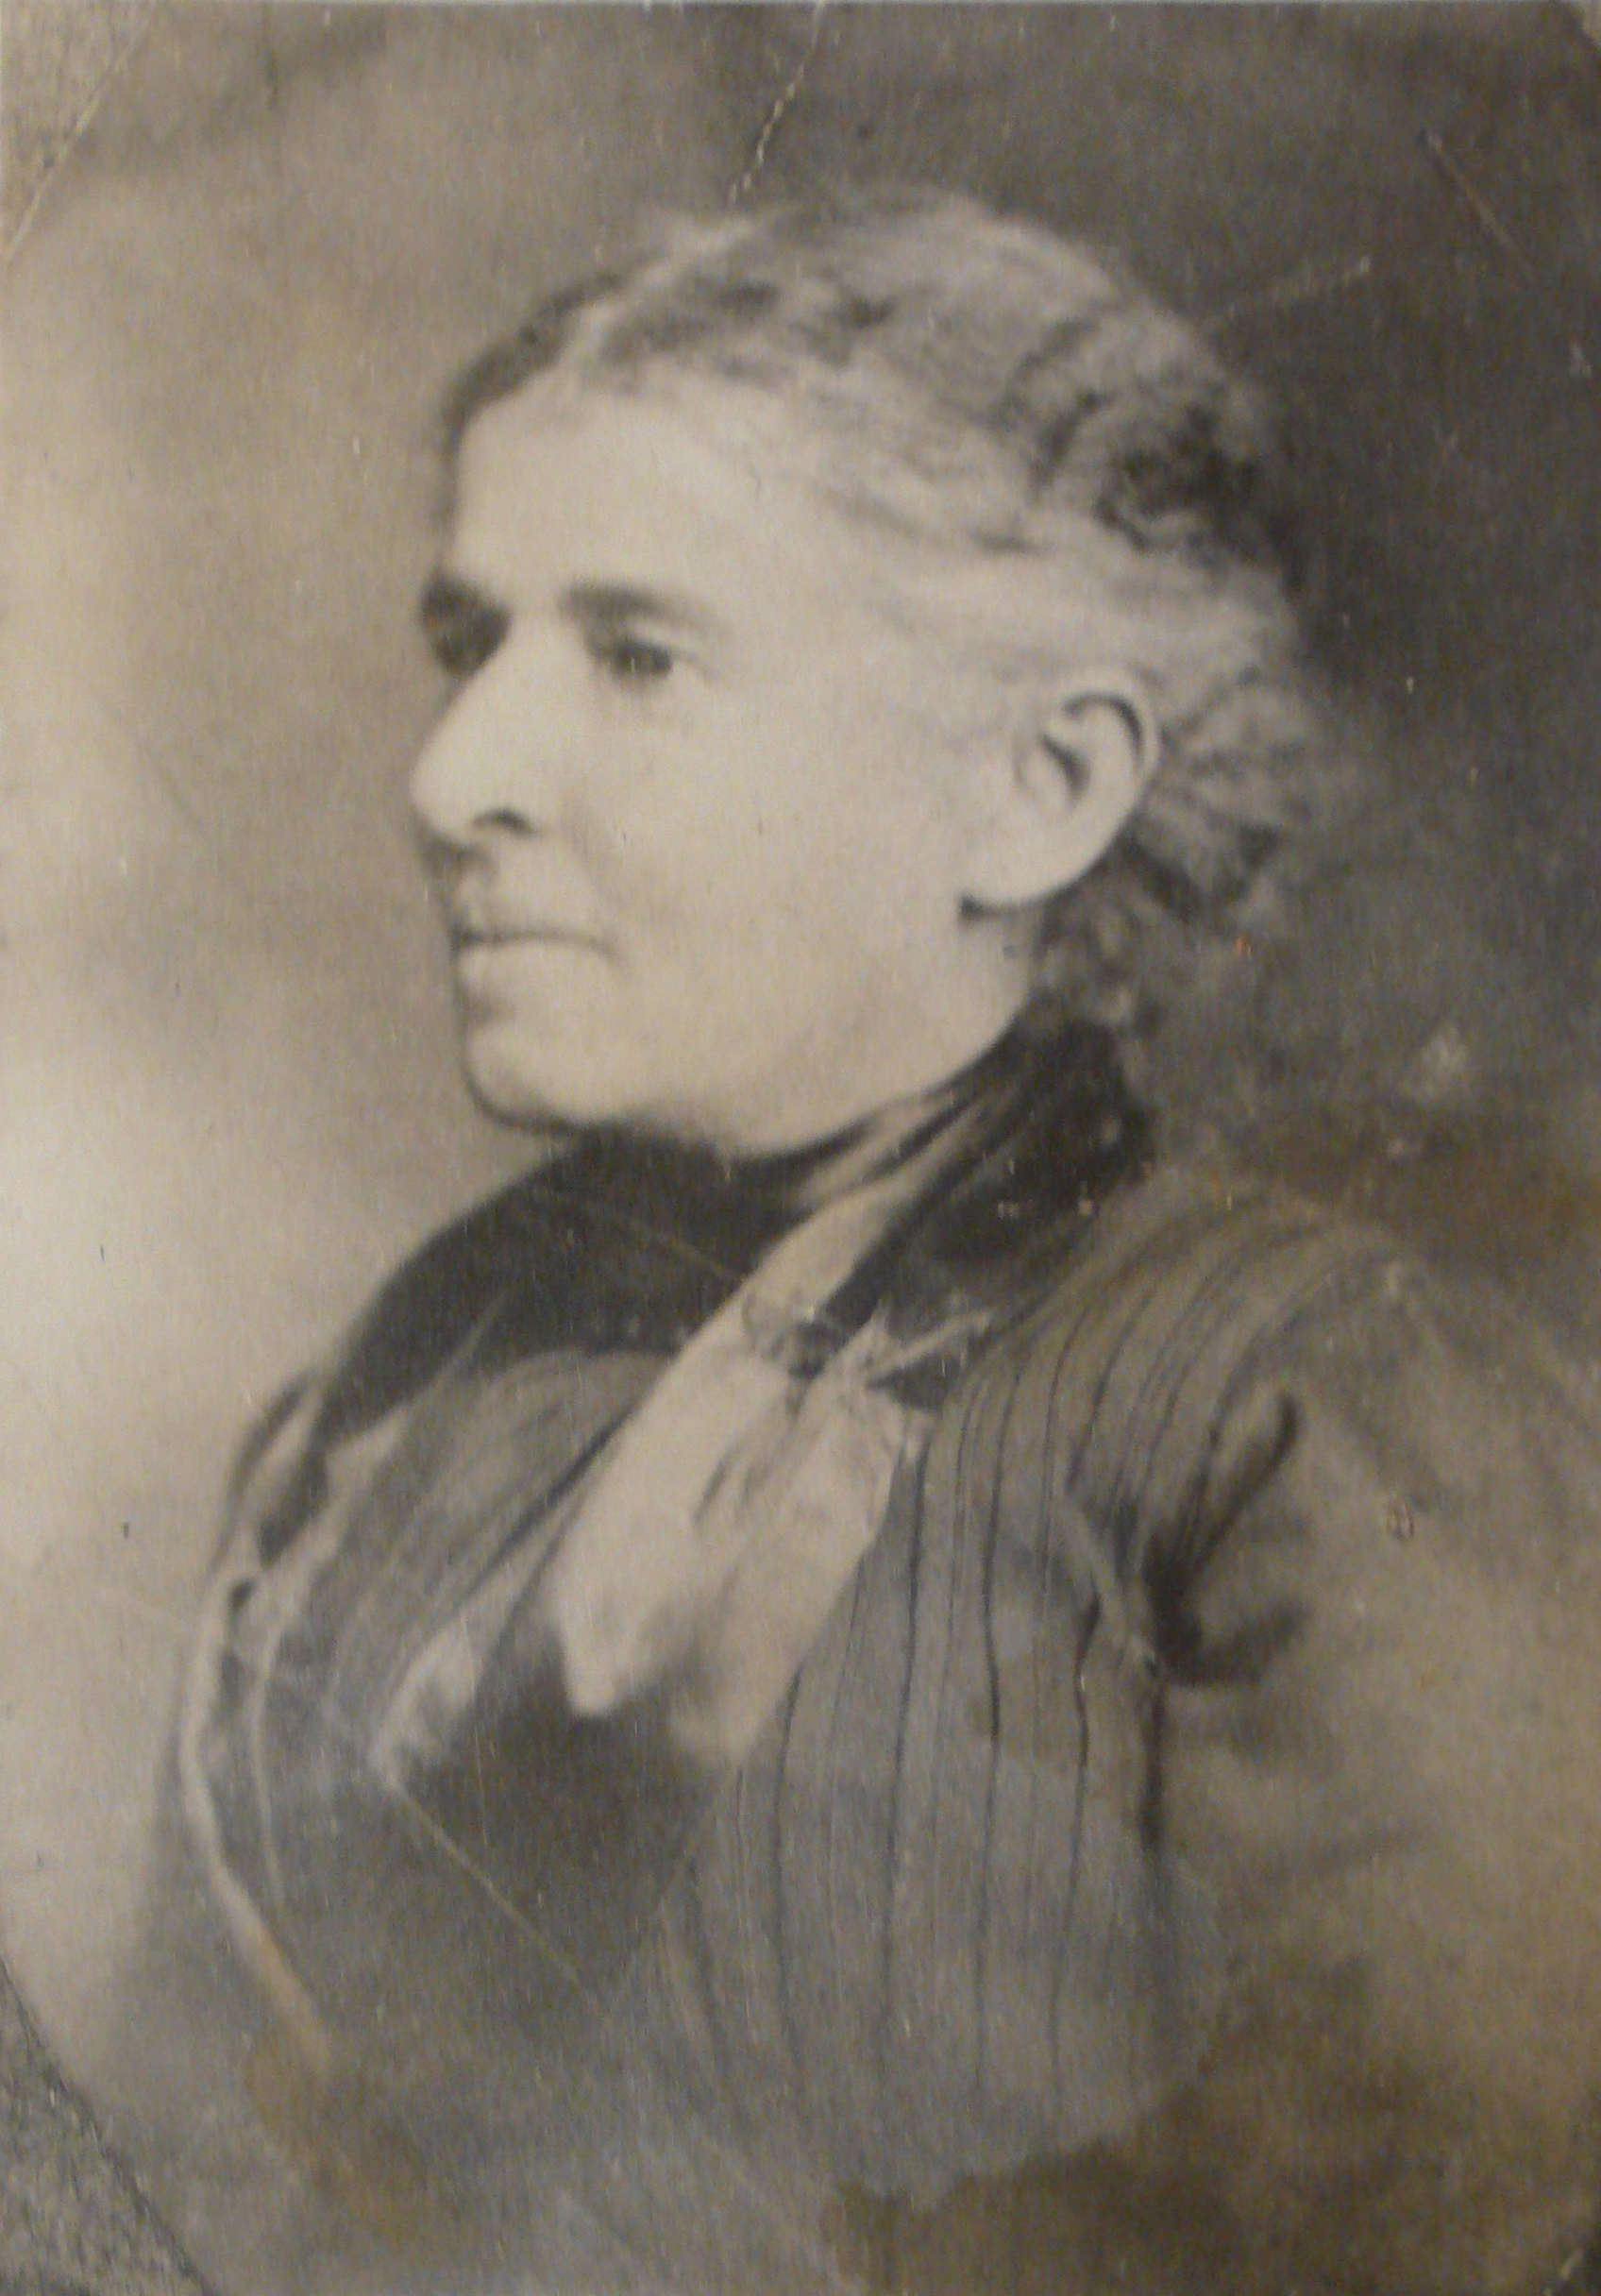 A portrait of Martha S. Jones' great-great-grandmother, Susan Davis, who was born enslaved in Kentucky. (Martha S. Jones)